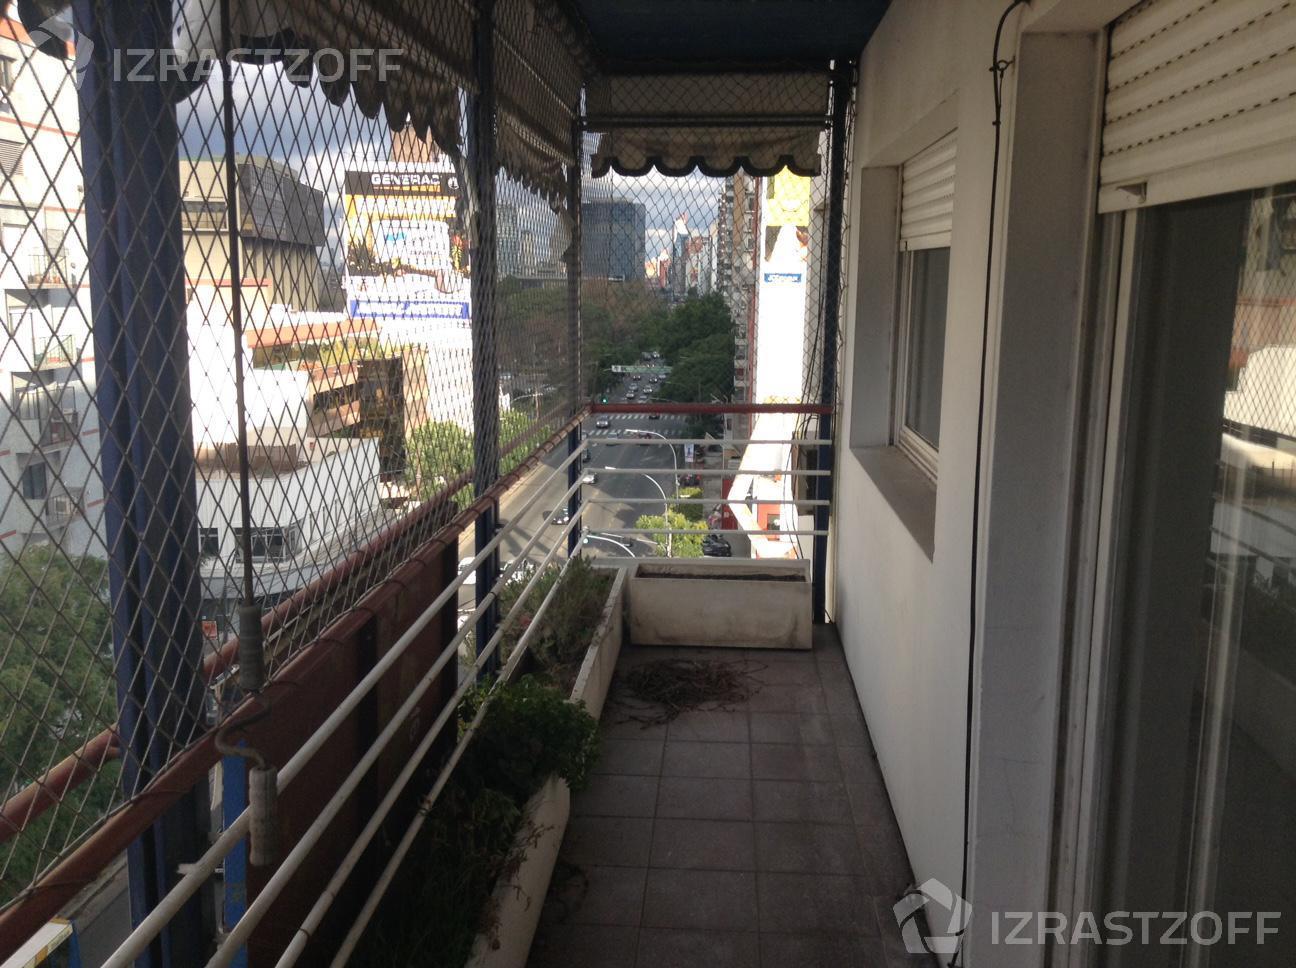 Departamento-Venta-V.Lopez-Vias/Rio-Av. Libertador al 800